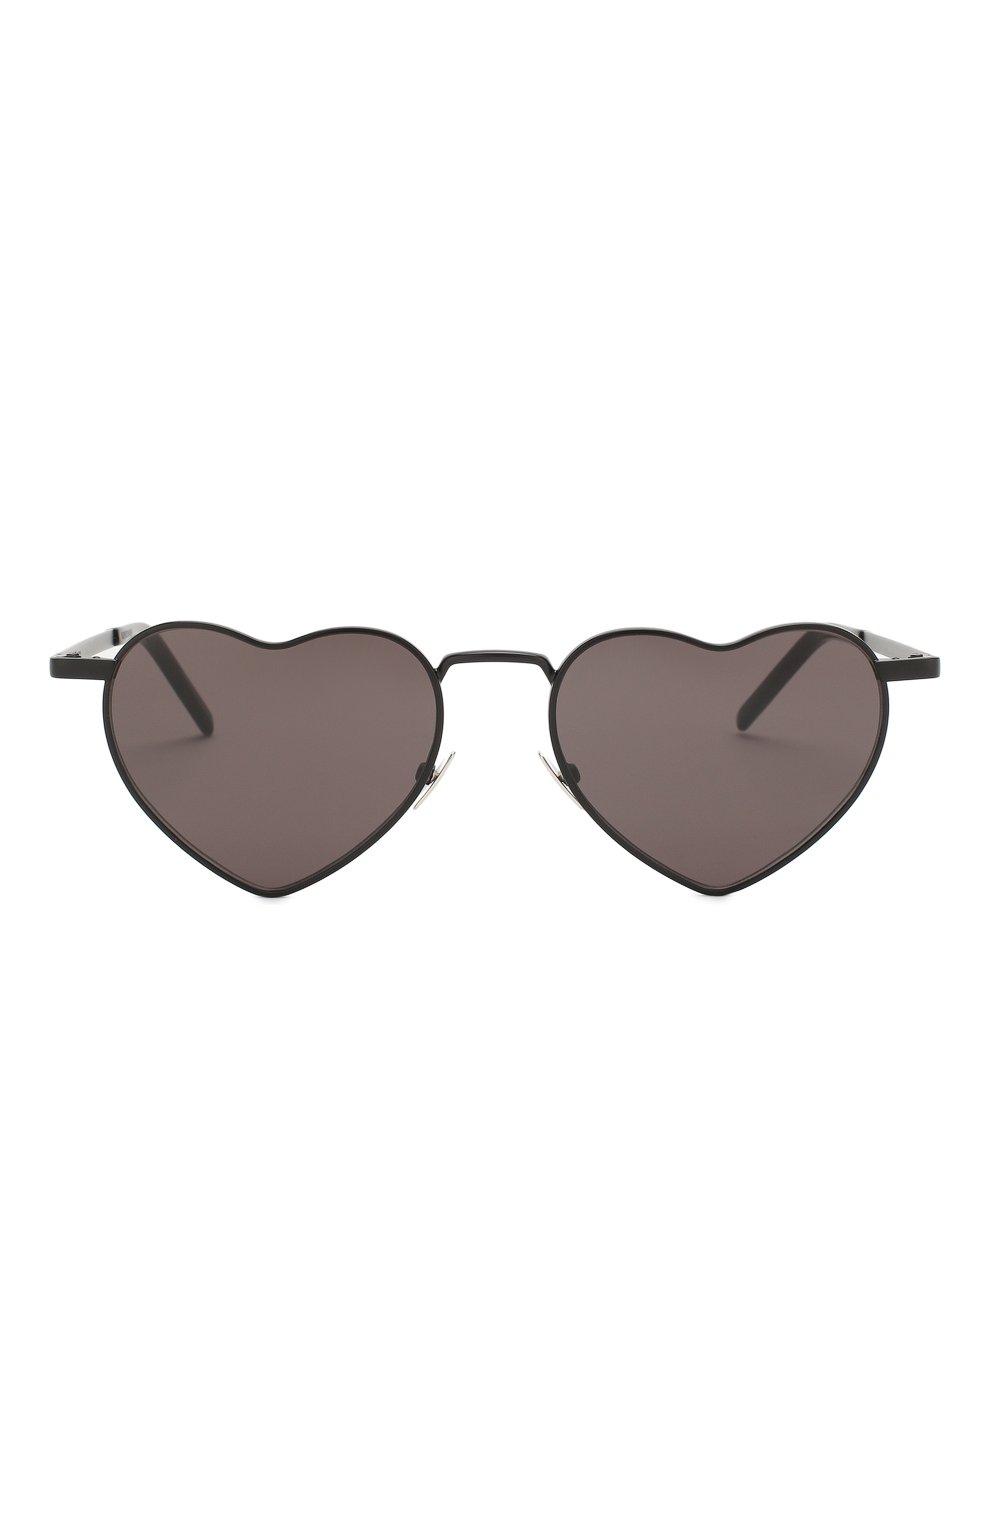 Женские солнцезащитные очки SAINT LAURENT черного цвета, арт. SL 301 L0UL0U 002 | Фото 3